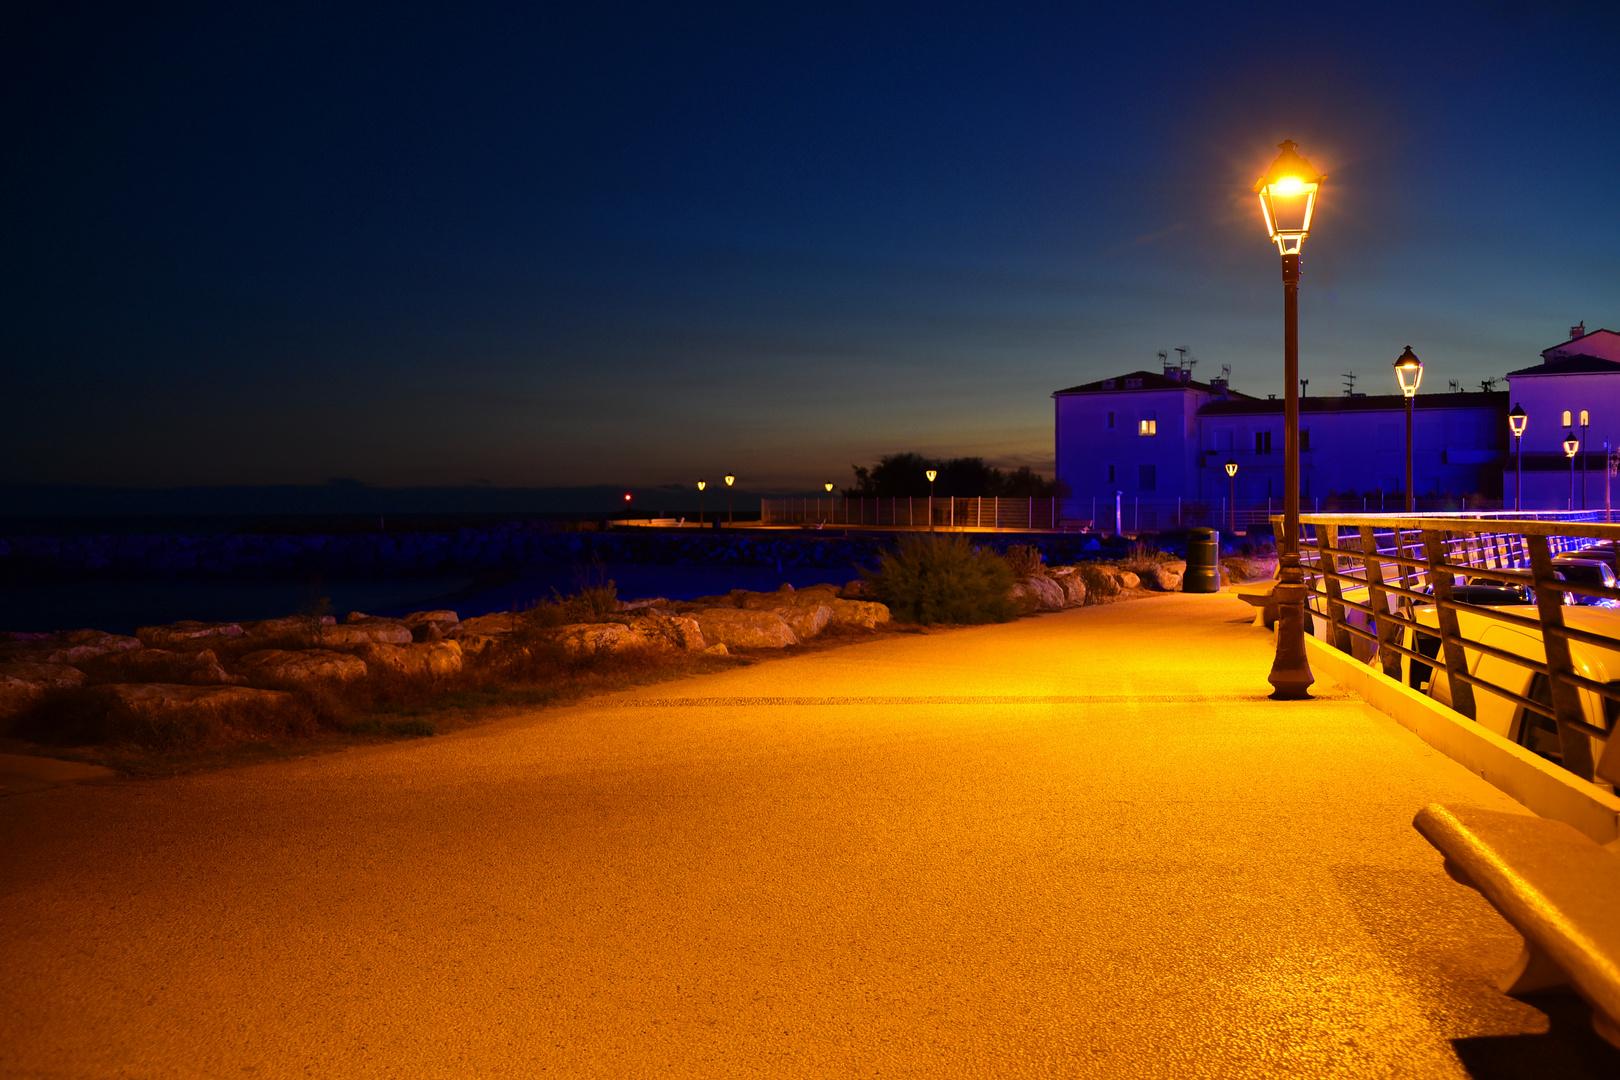 Ein Abend in Saintes-Maries-de-la-Mer